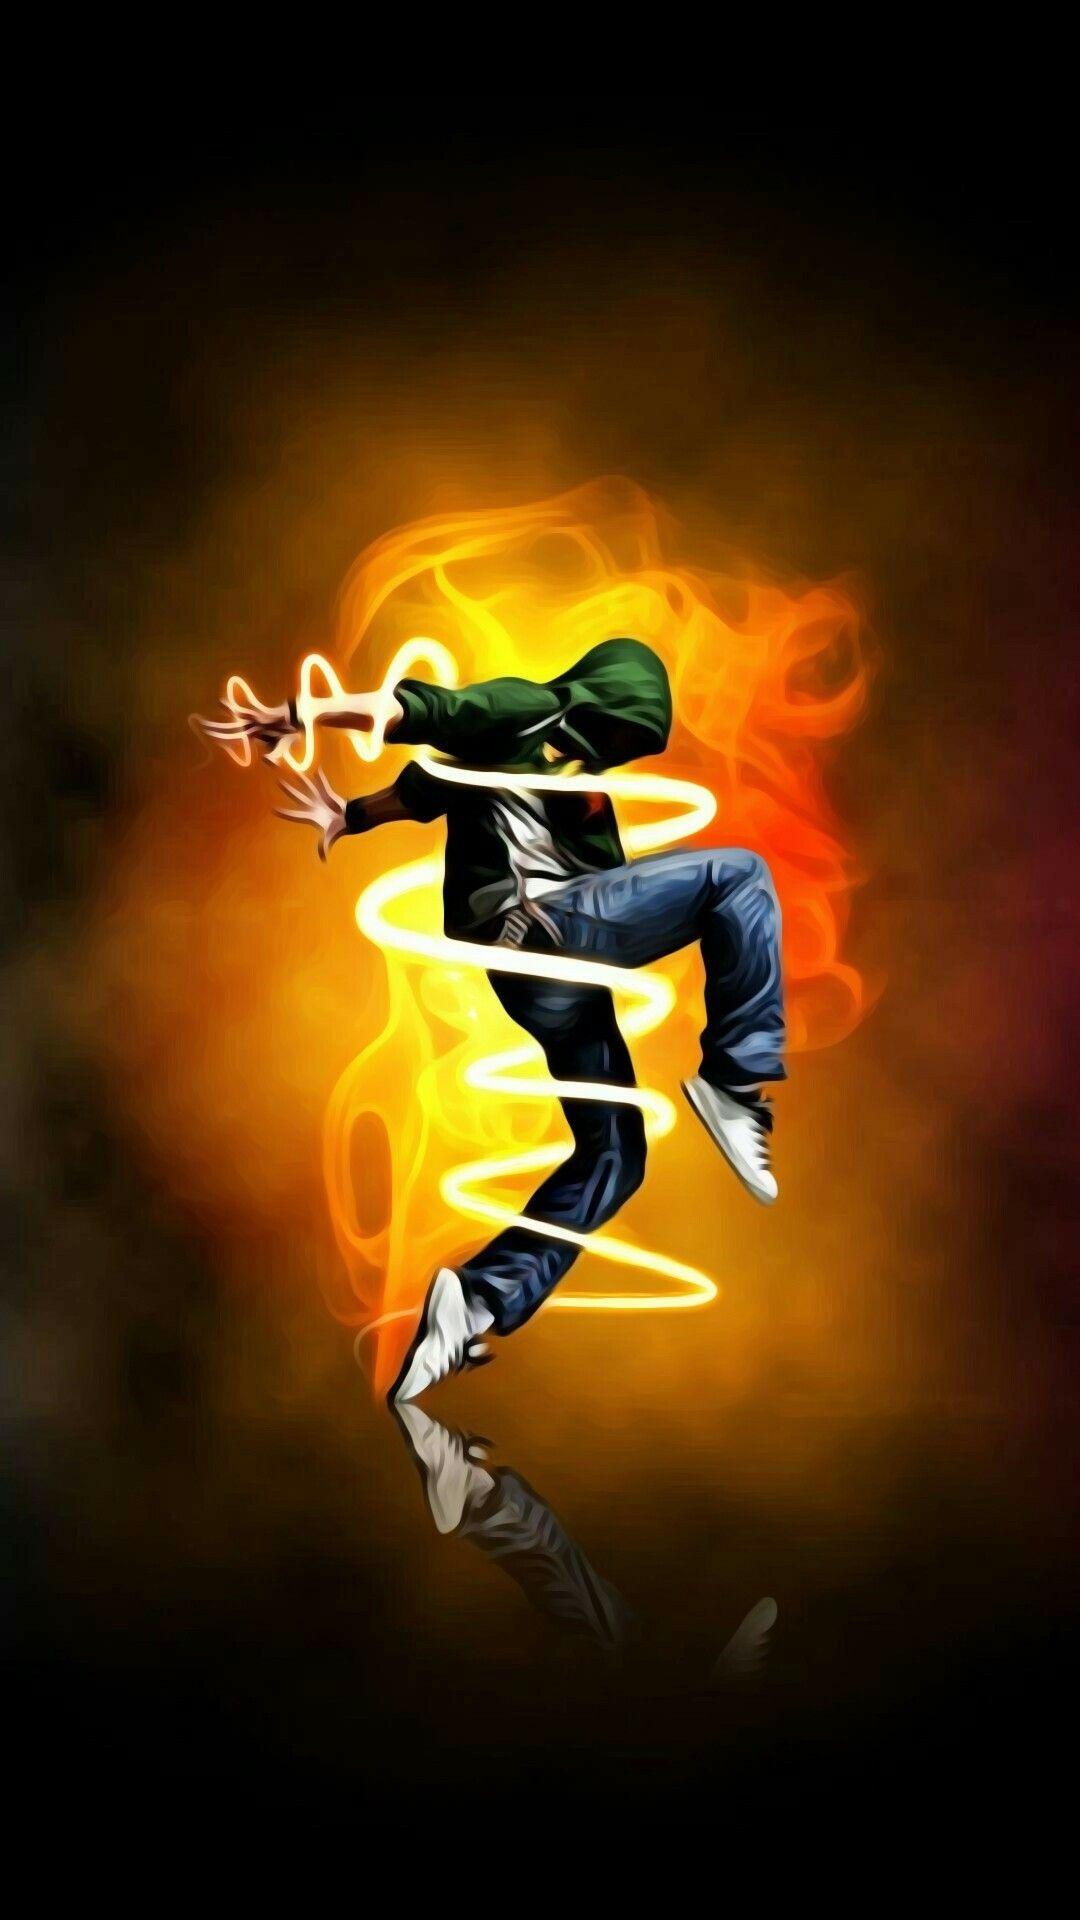 Pin By Krishnan Krishnan On Phone Backgrounds Hipster 01 Dance Wallpaper Music Wallpaper Dance Background